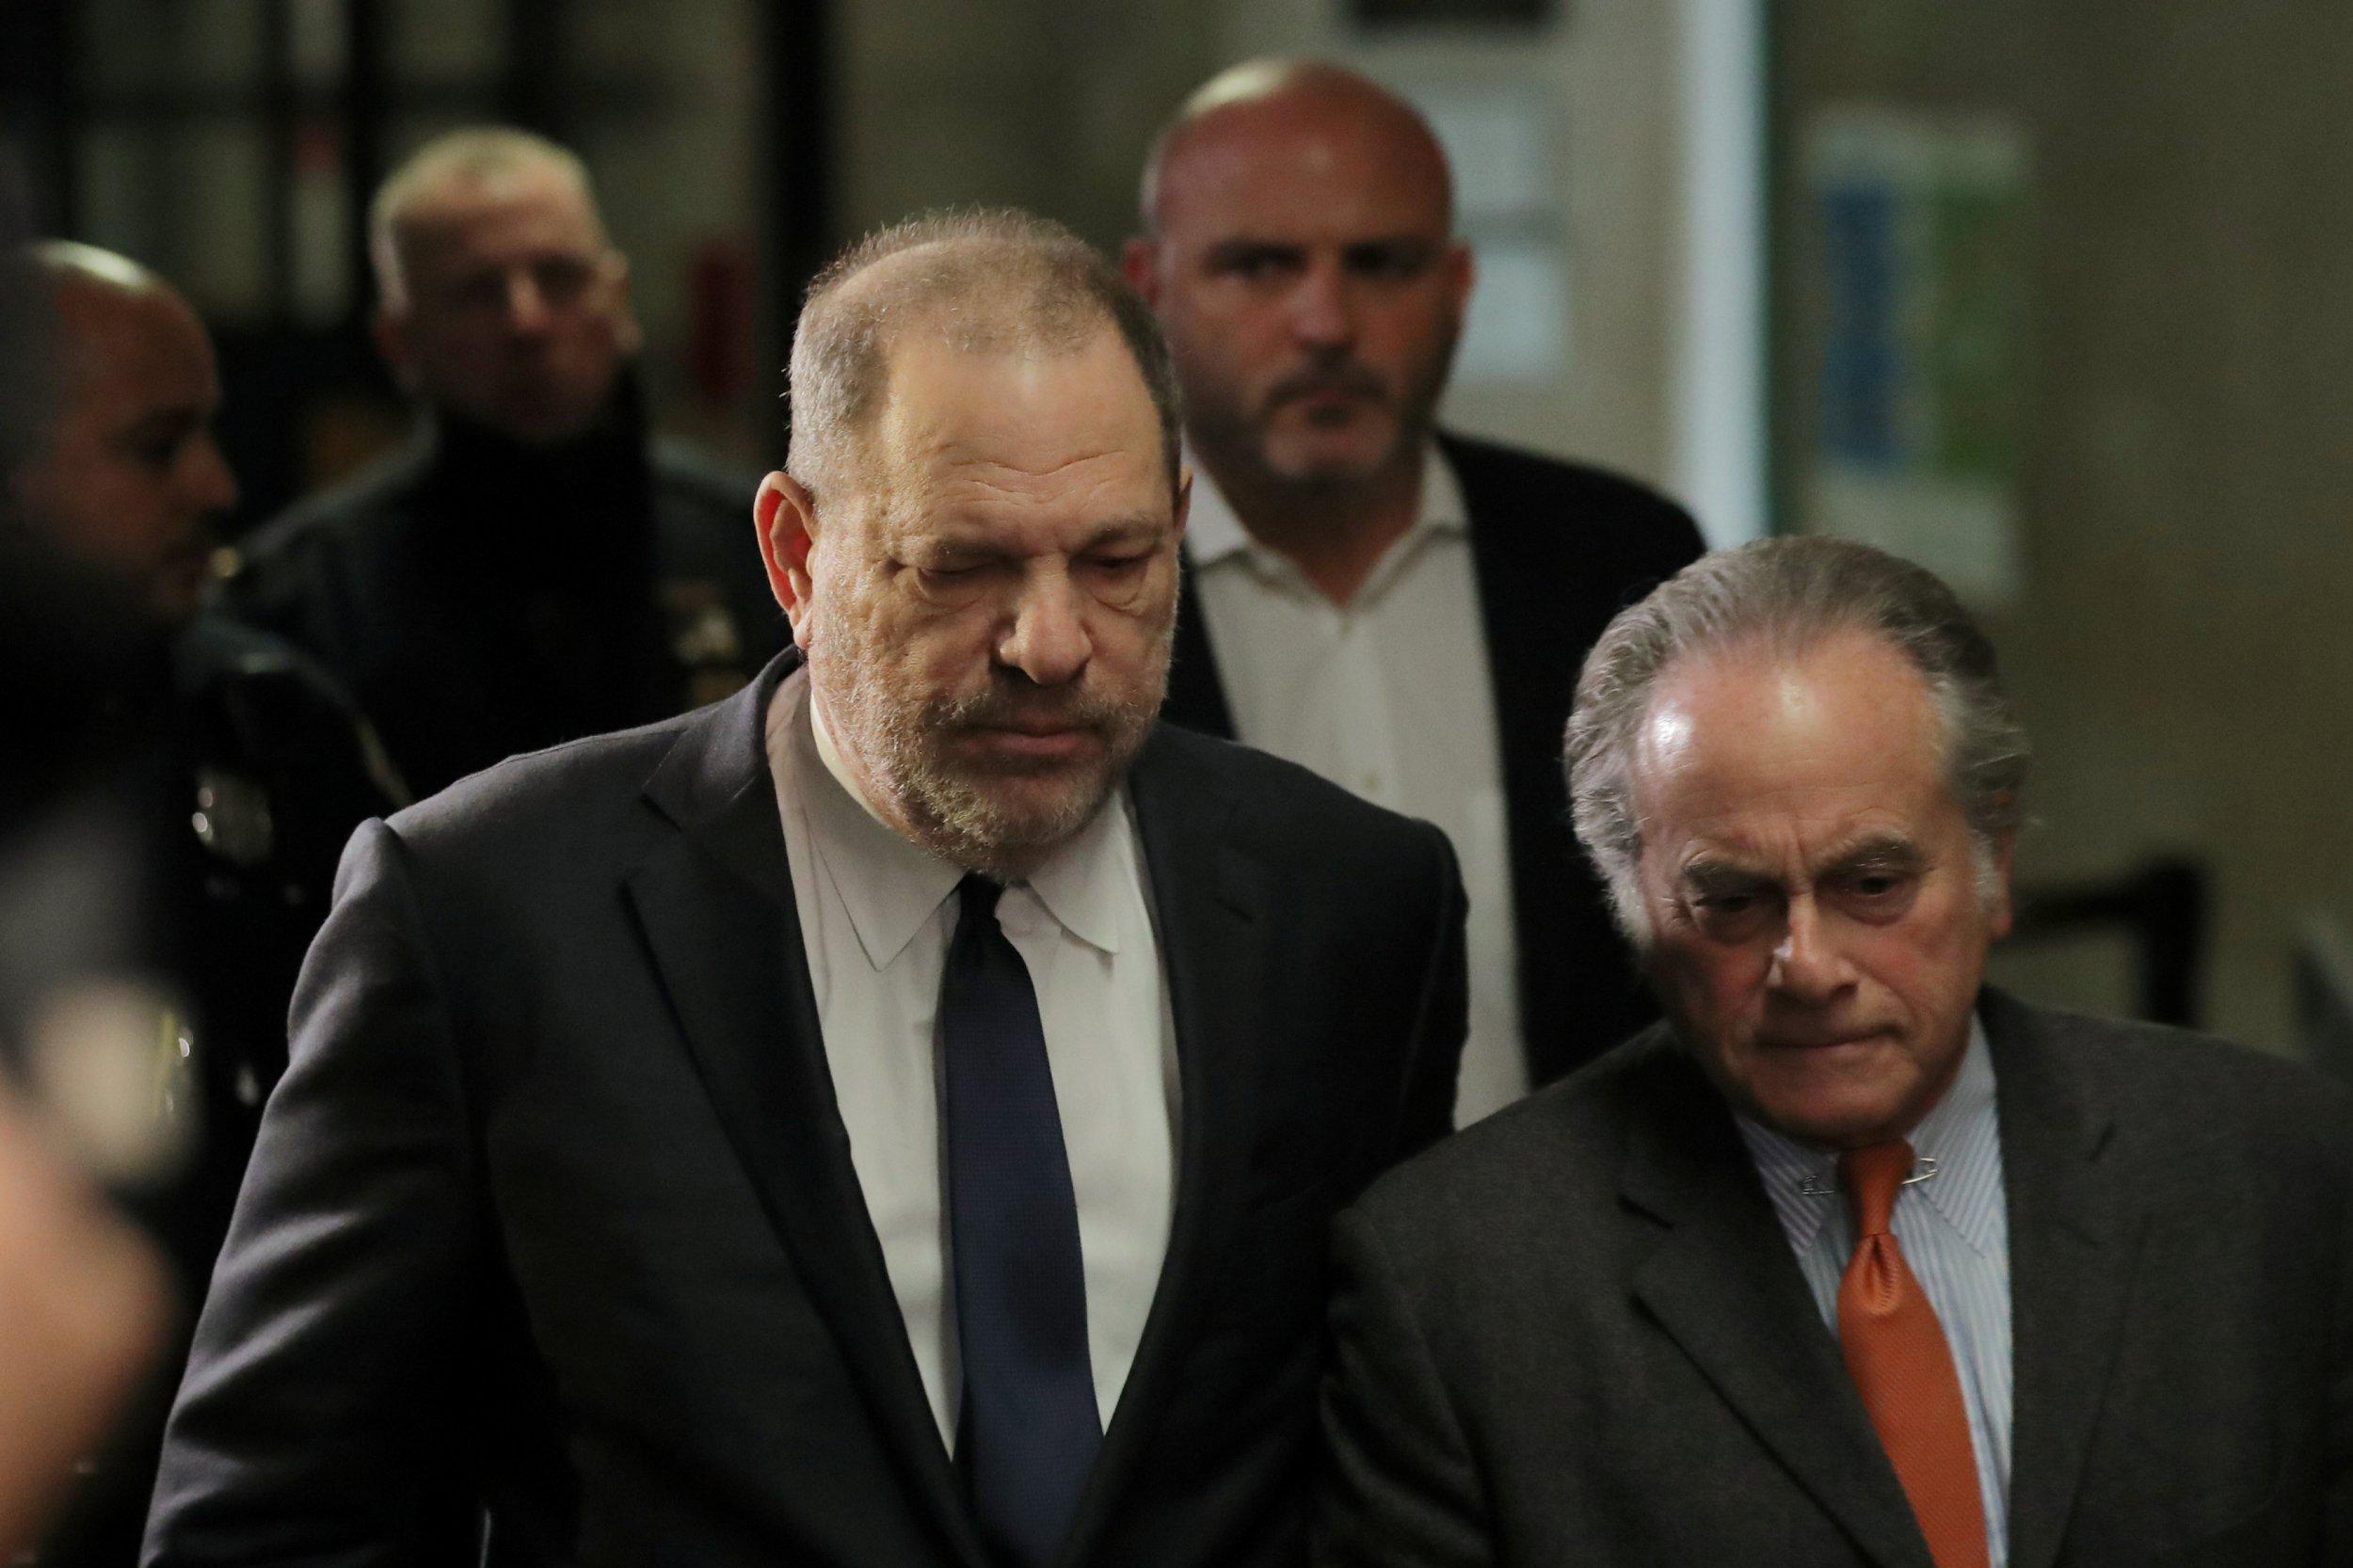 Harvey Weinstein case will move forward as judge rejects dismissal plea